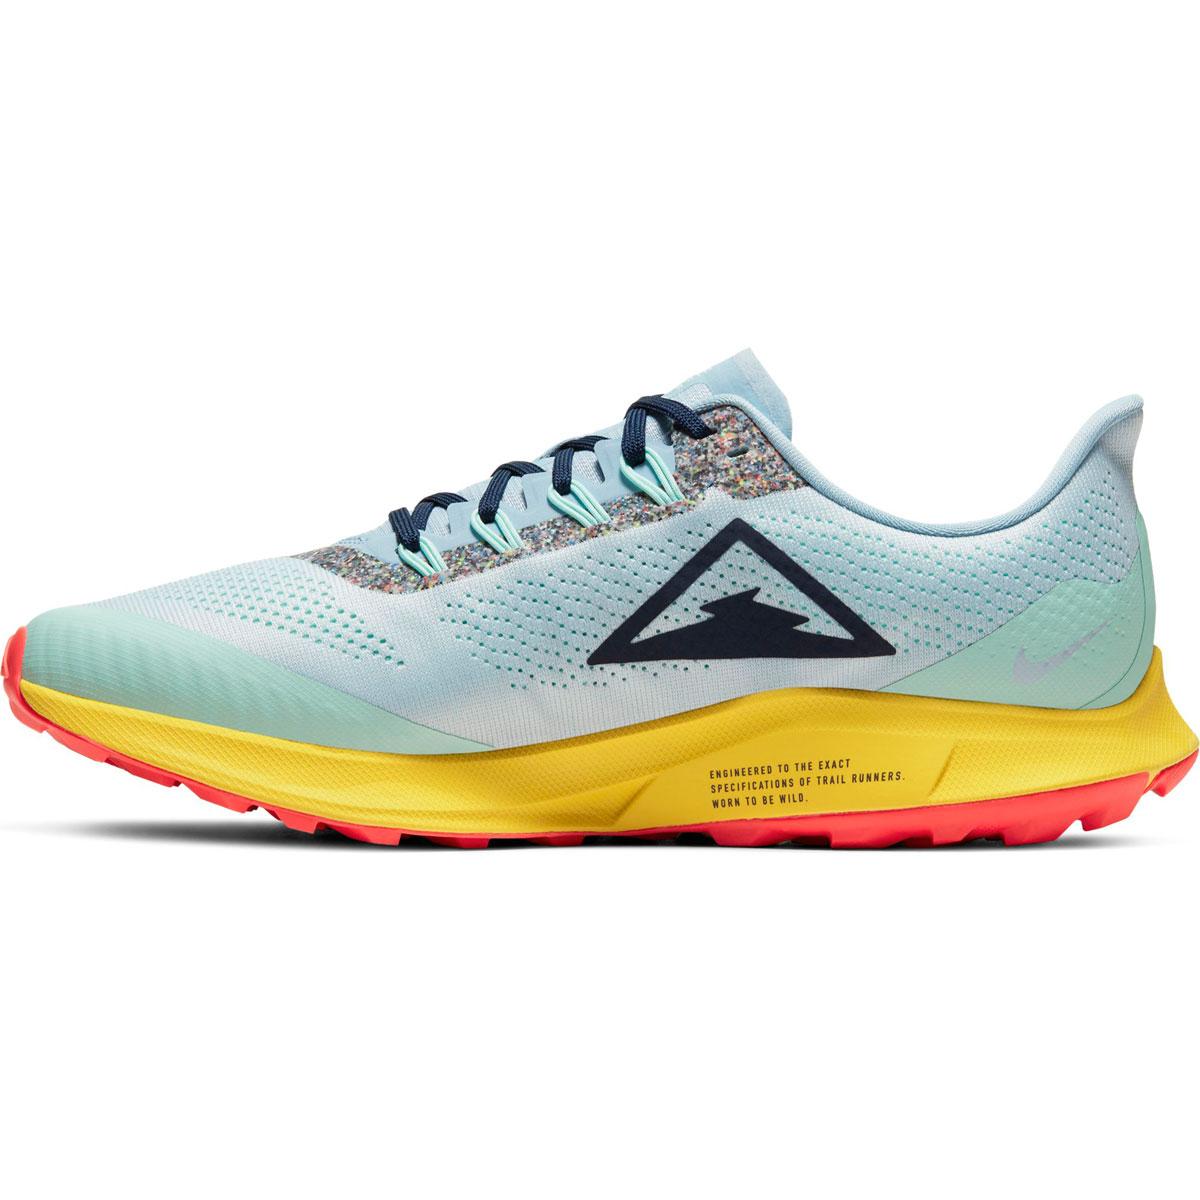 Men's Nike Air Zoom Pegasus 36 Trail Running Shoe - Color: Aura/Blackened Blue/Light Armory (Regular Width) - Size: 6, Aura/Blackened Blue/Light Armory, large, image 2